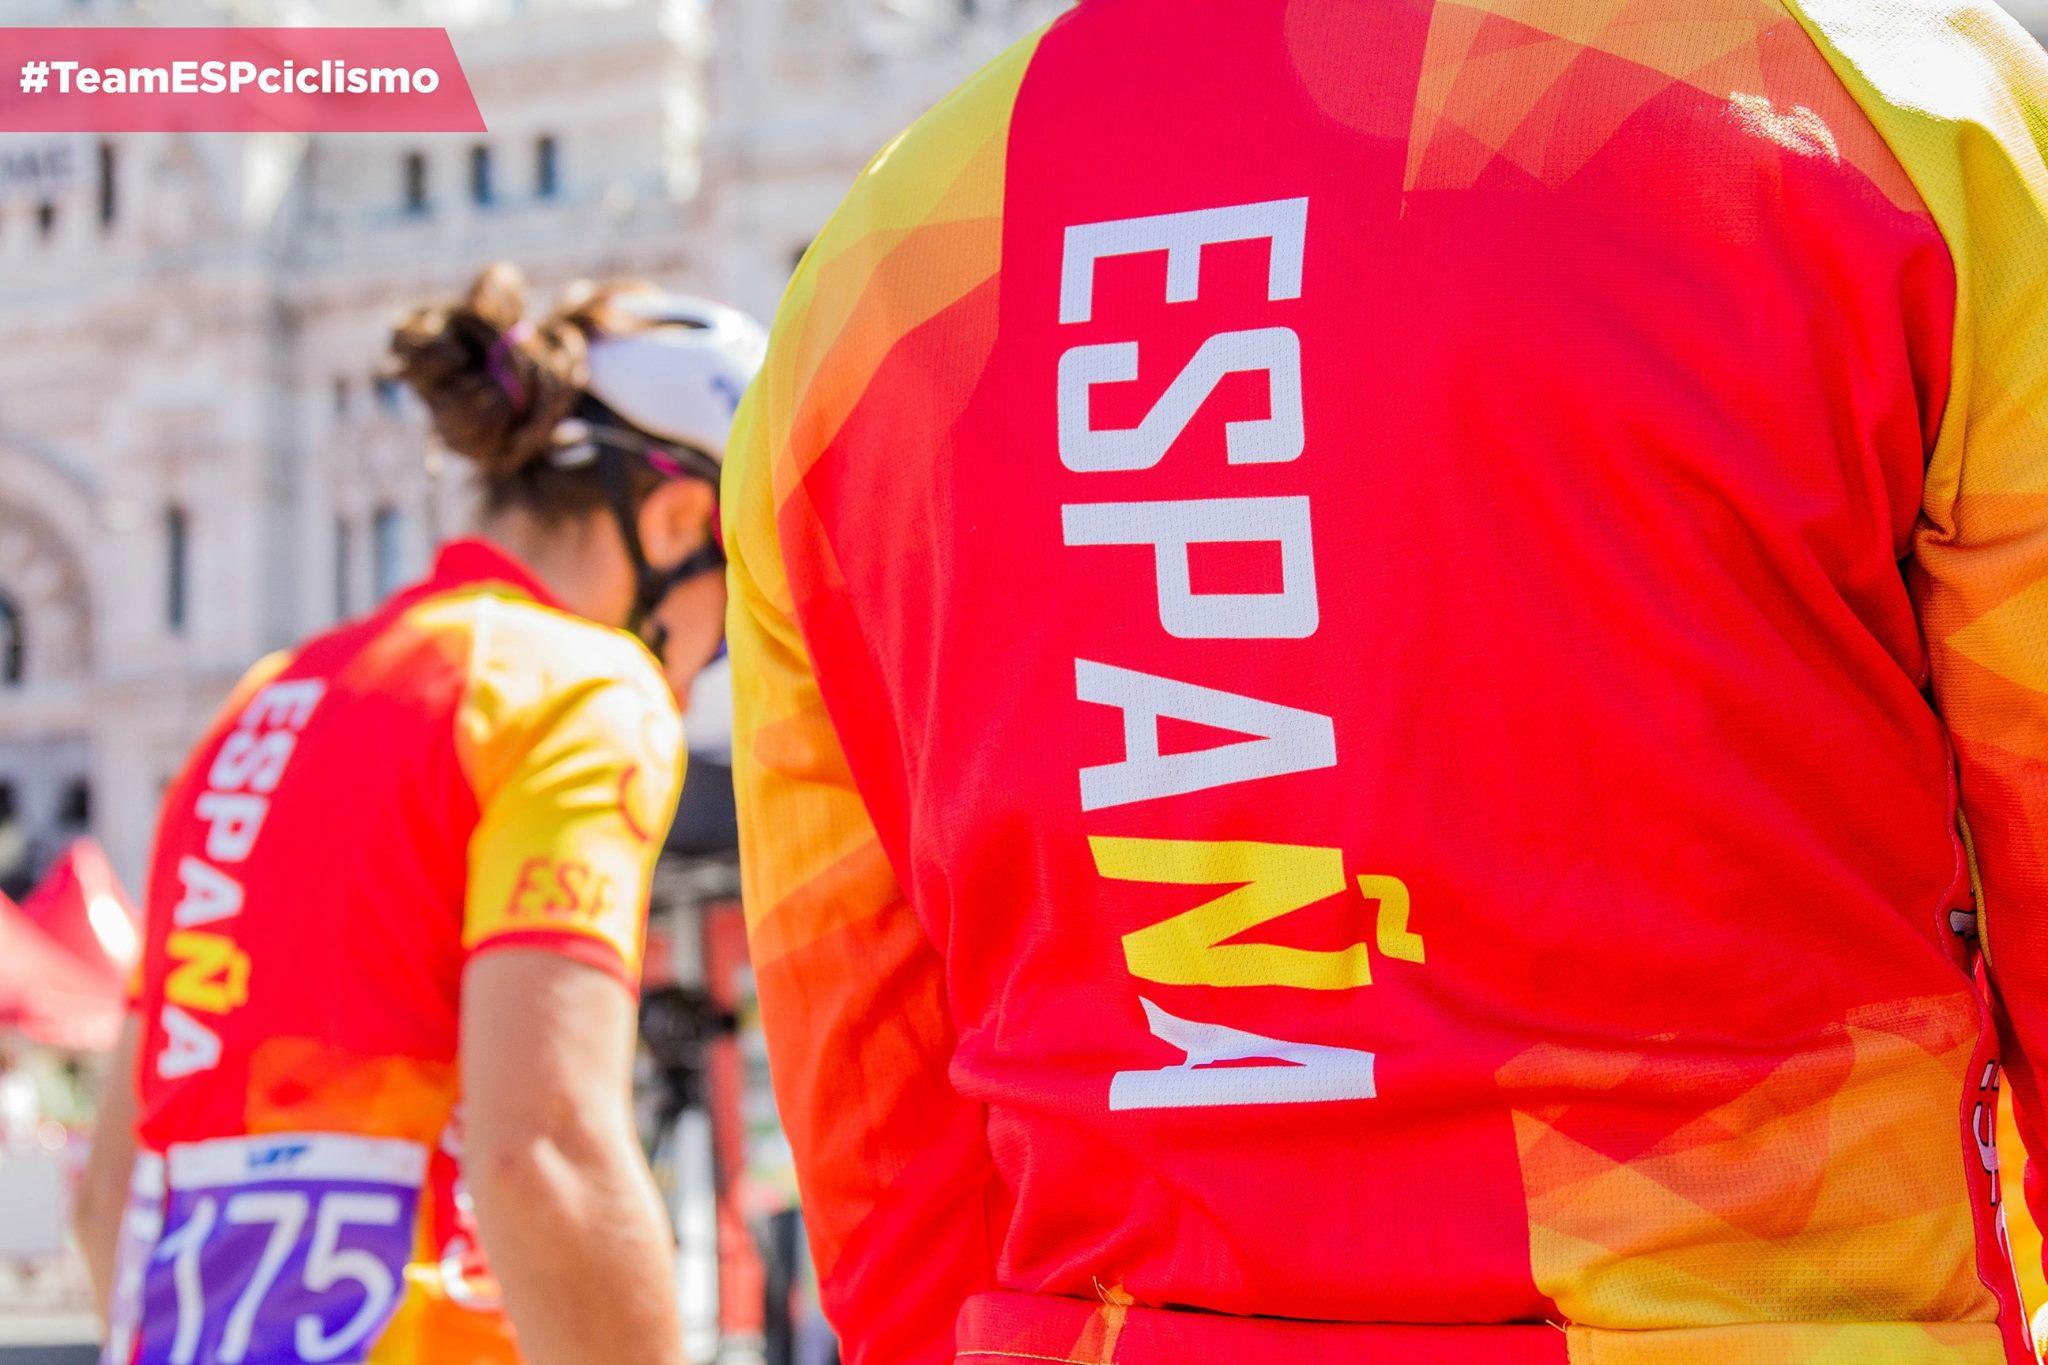 #TeamESPciclismo / Madrid Challenge / Carretera Fem / 2017